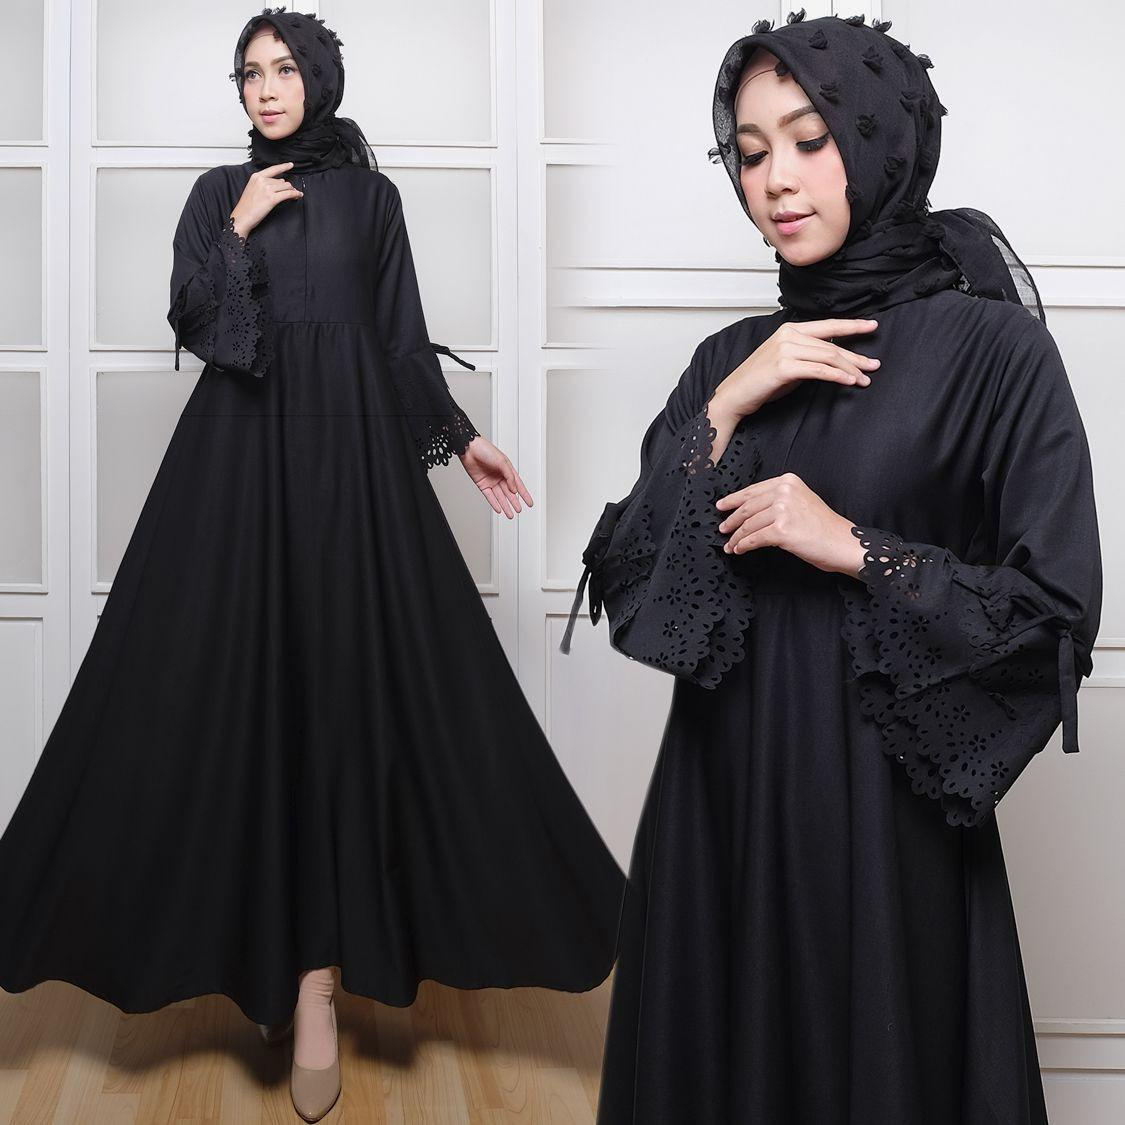 Baby Talk Club Gamis Polos Gamis Syari Baloteli Laser Busui Gaun Pesta Panjang Baju Hijab Terusan Pengajian Wanita Muslimah Dress Lengan Panjang Long Dress Casual Wanita - Dress Gamis Lebaran